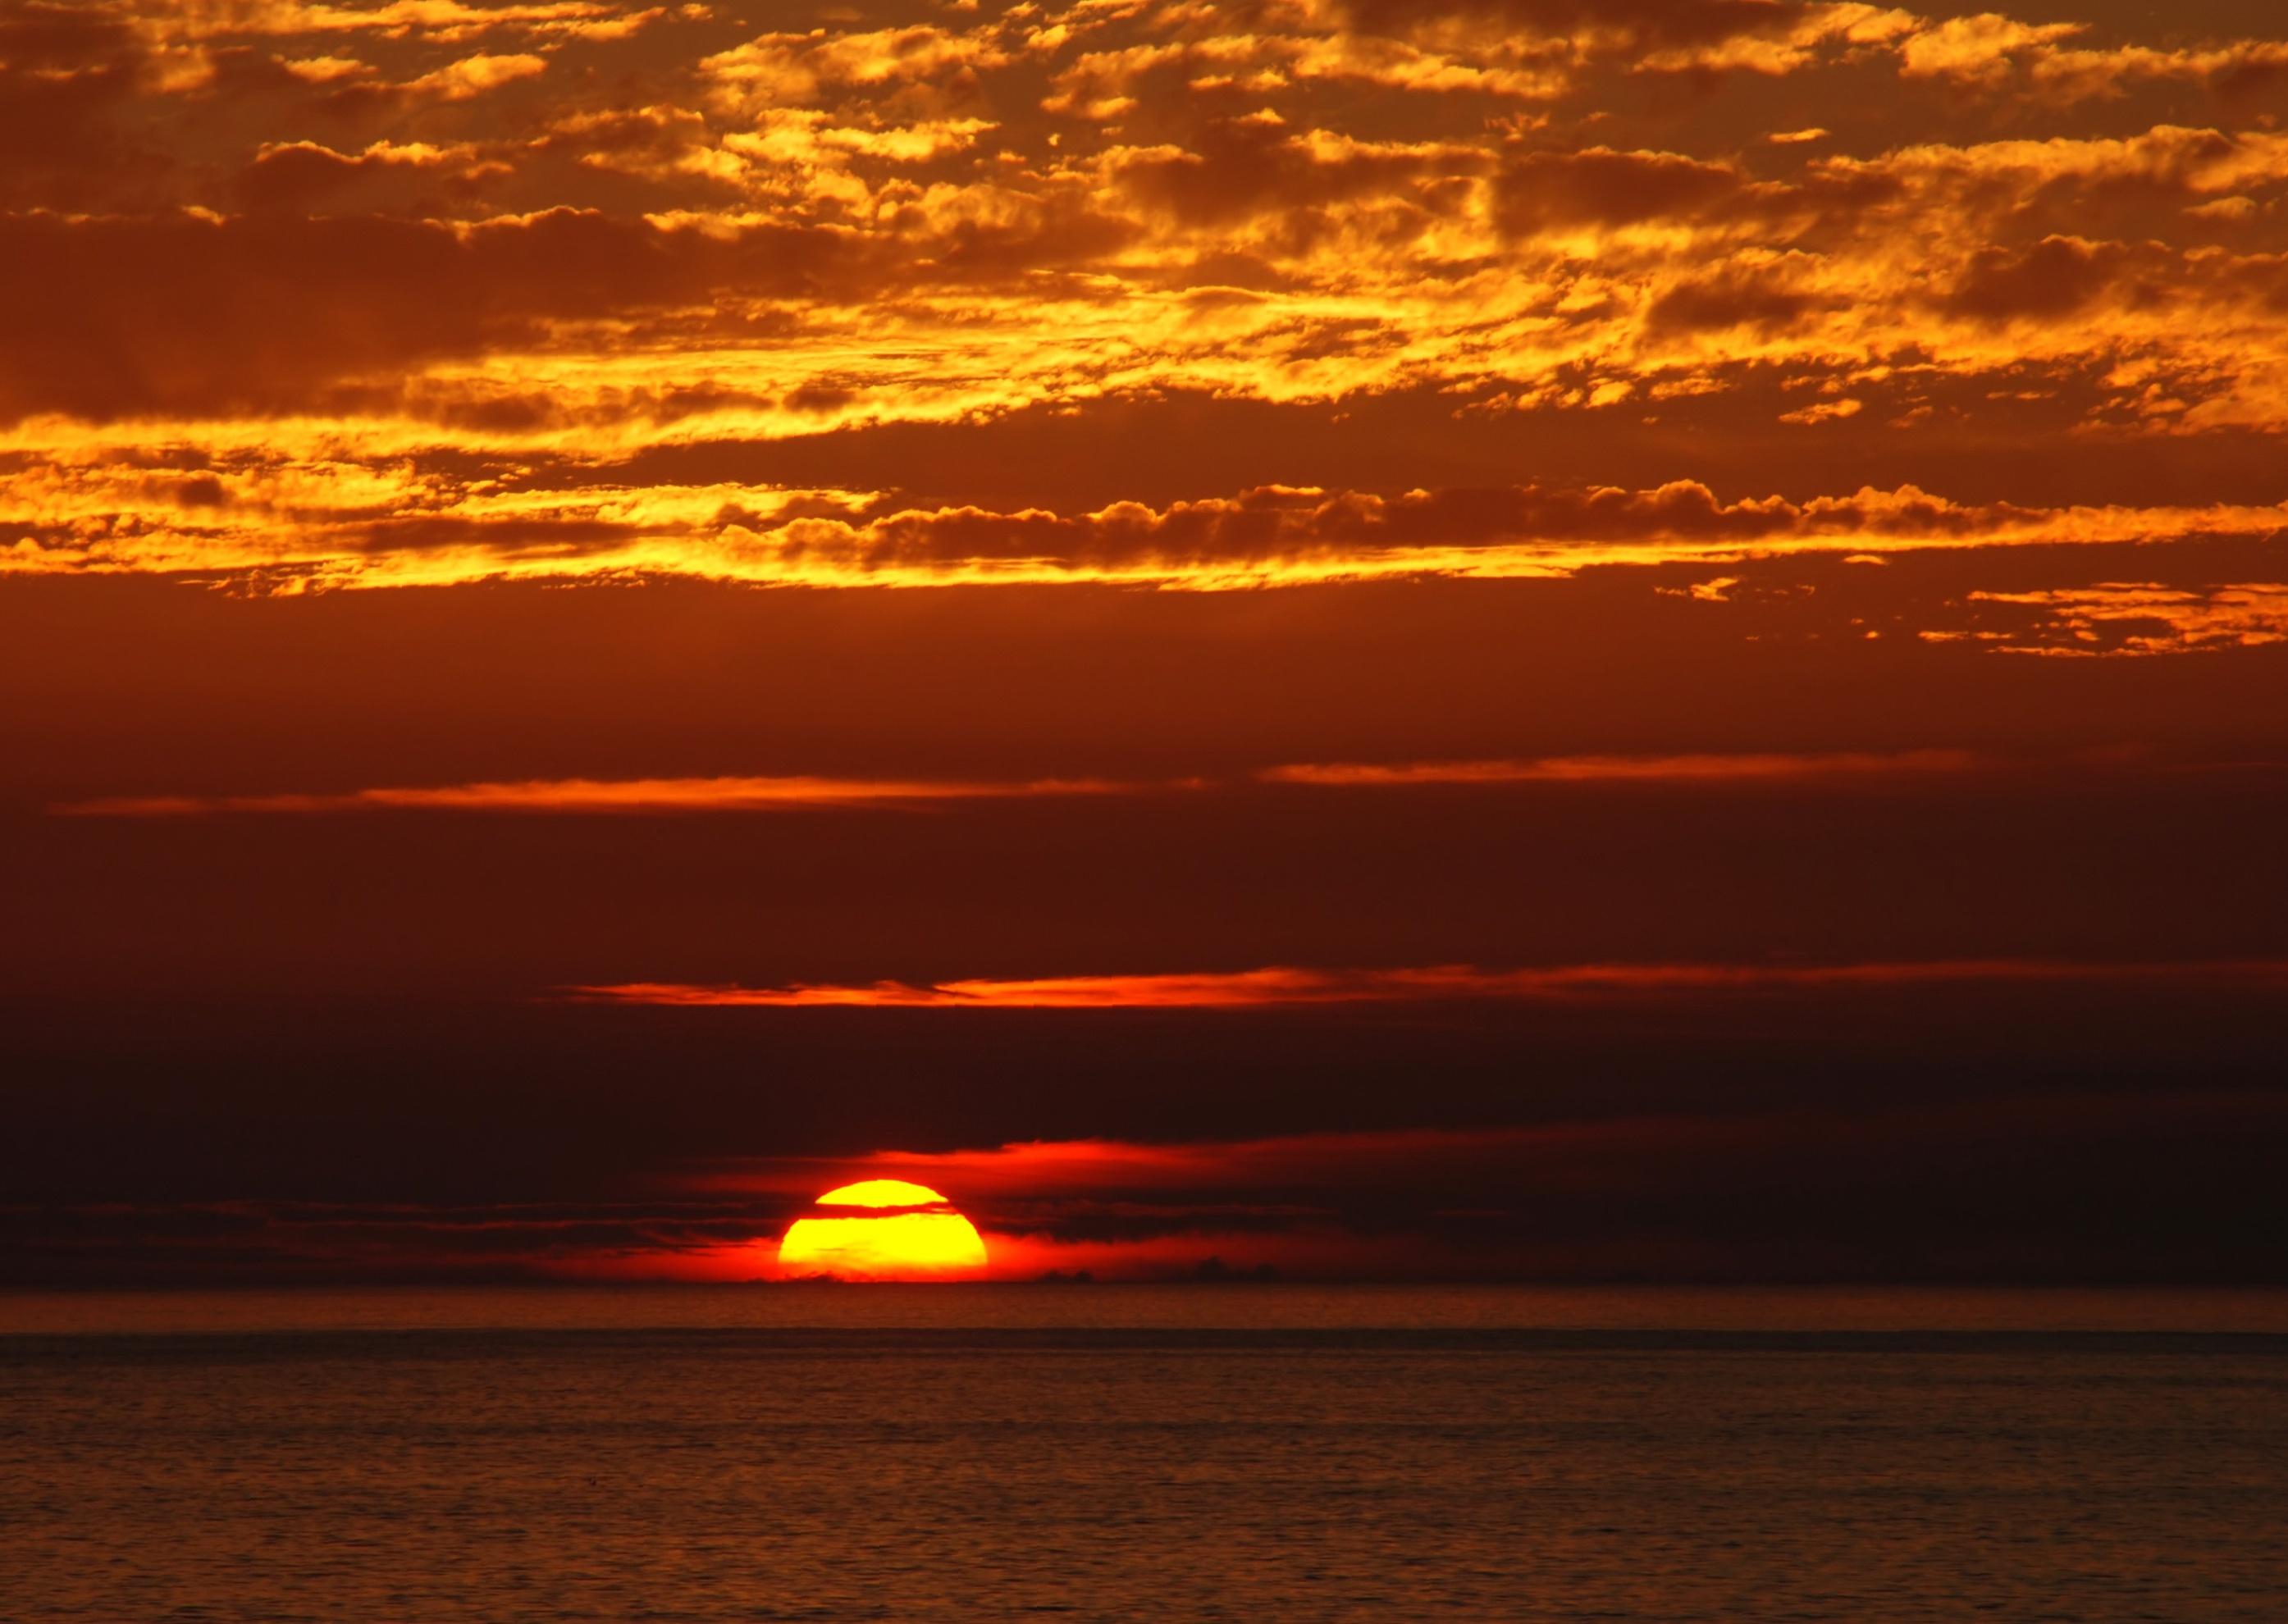 filosofi sunset